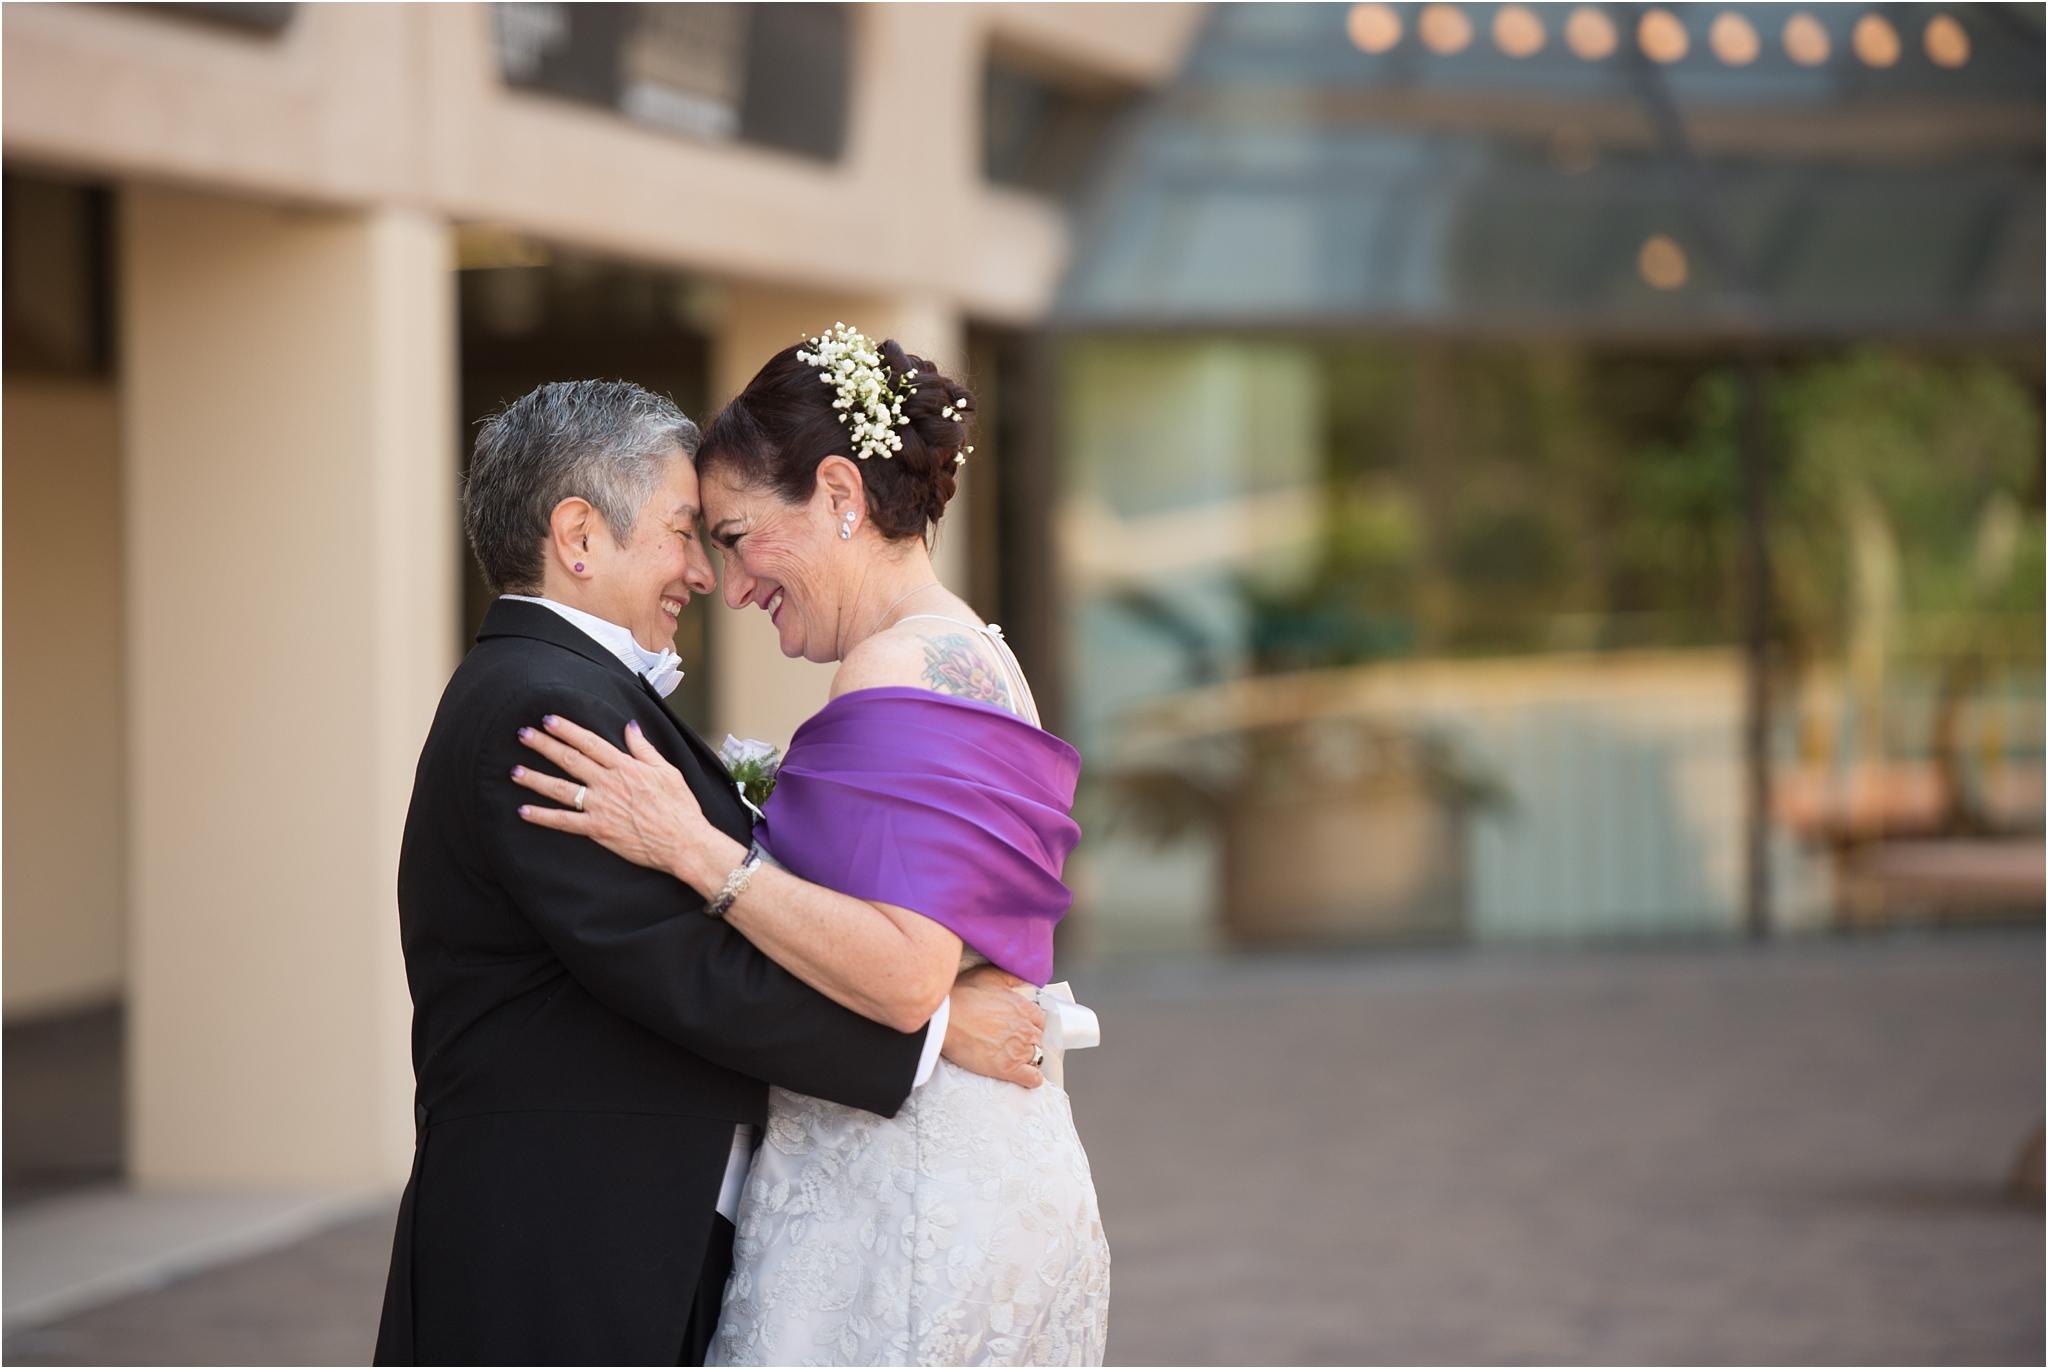 kayla kitts photography - albuquerque wedding photographer - hotel andaluz wedding_0016.jpg